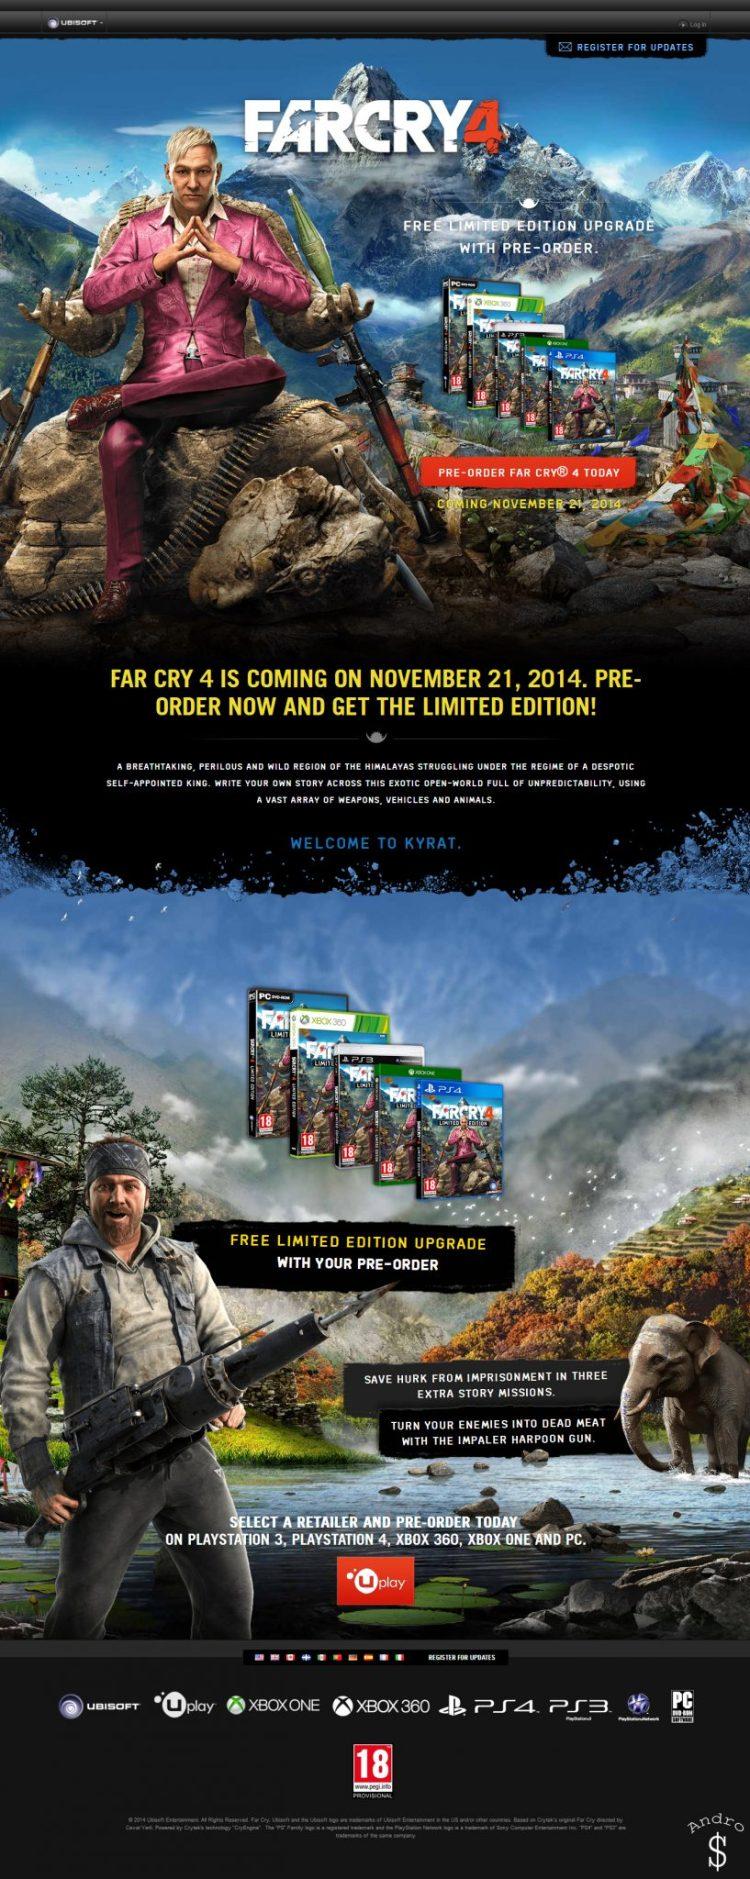 Far Cry 4 Official Website